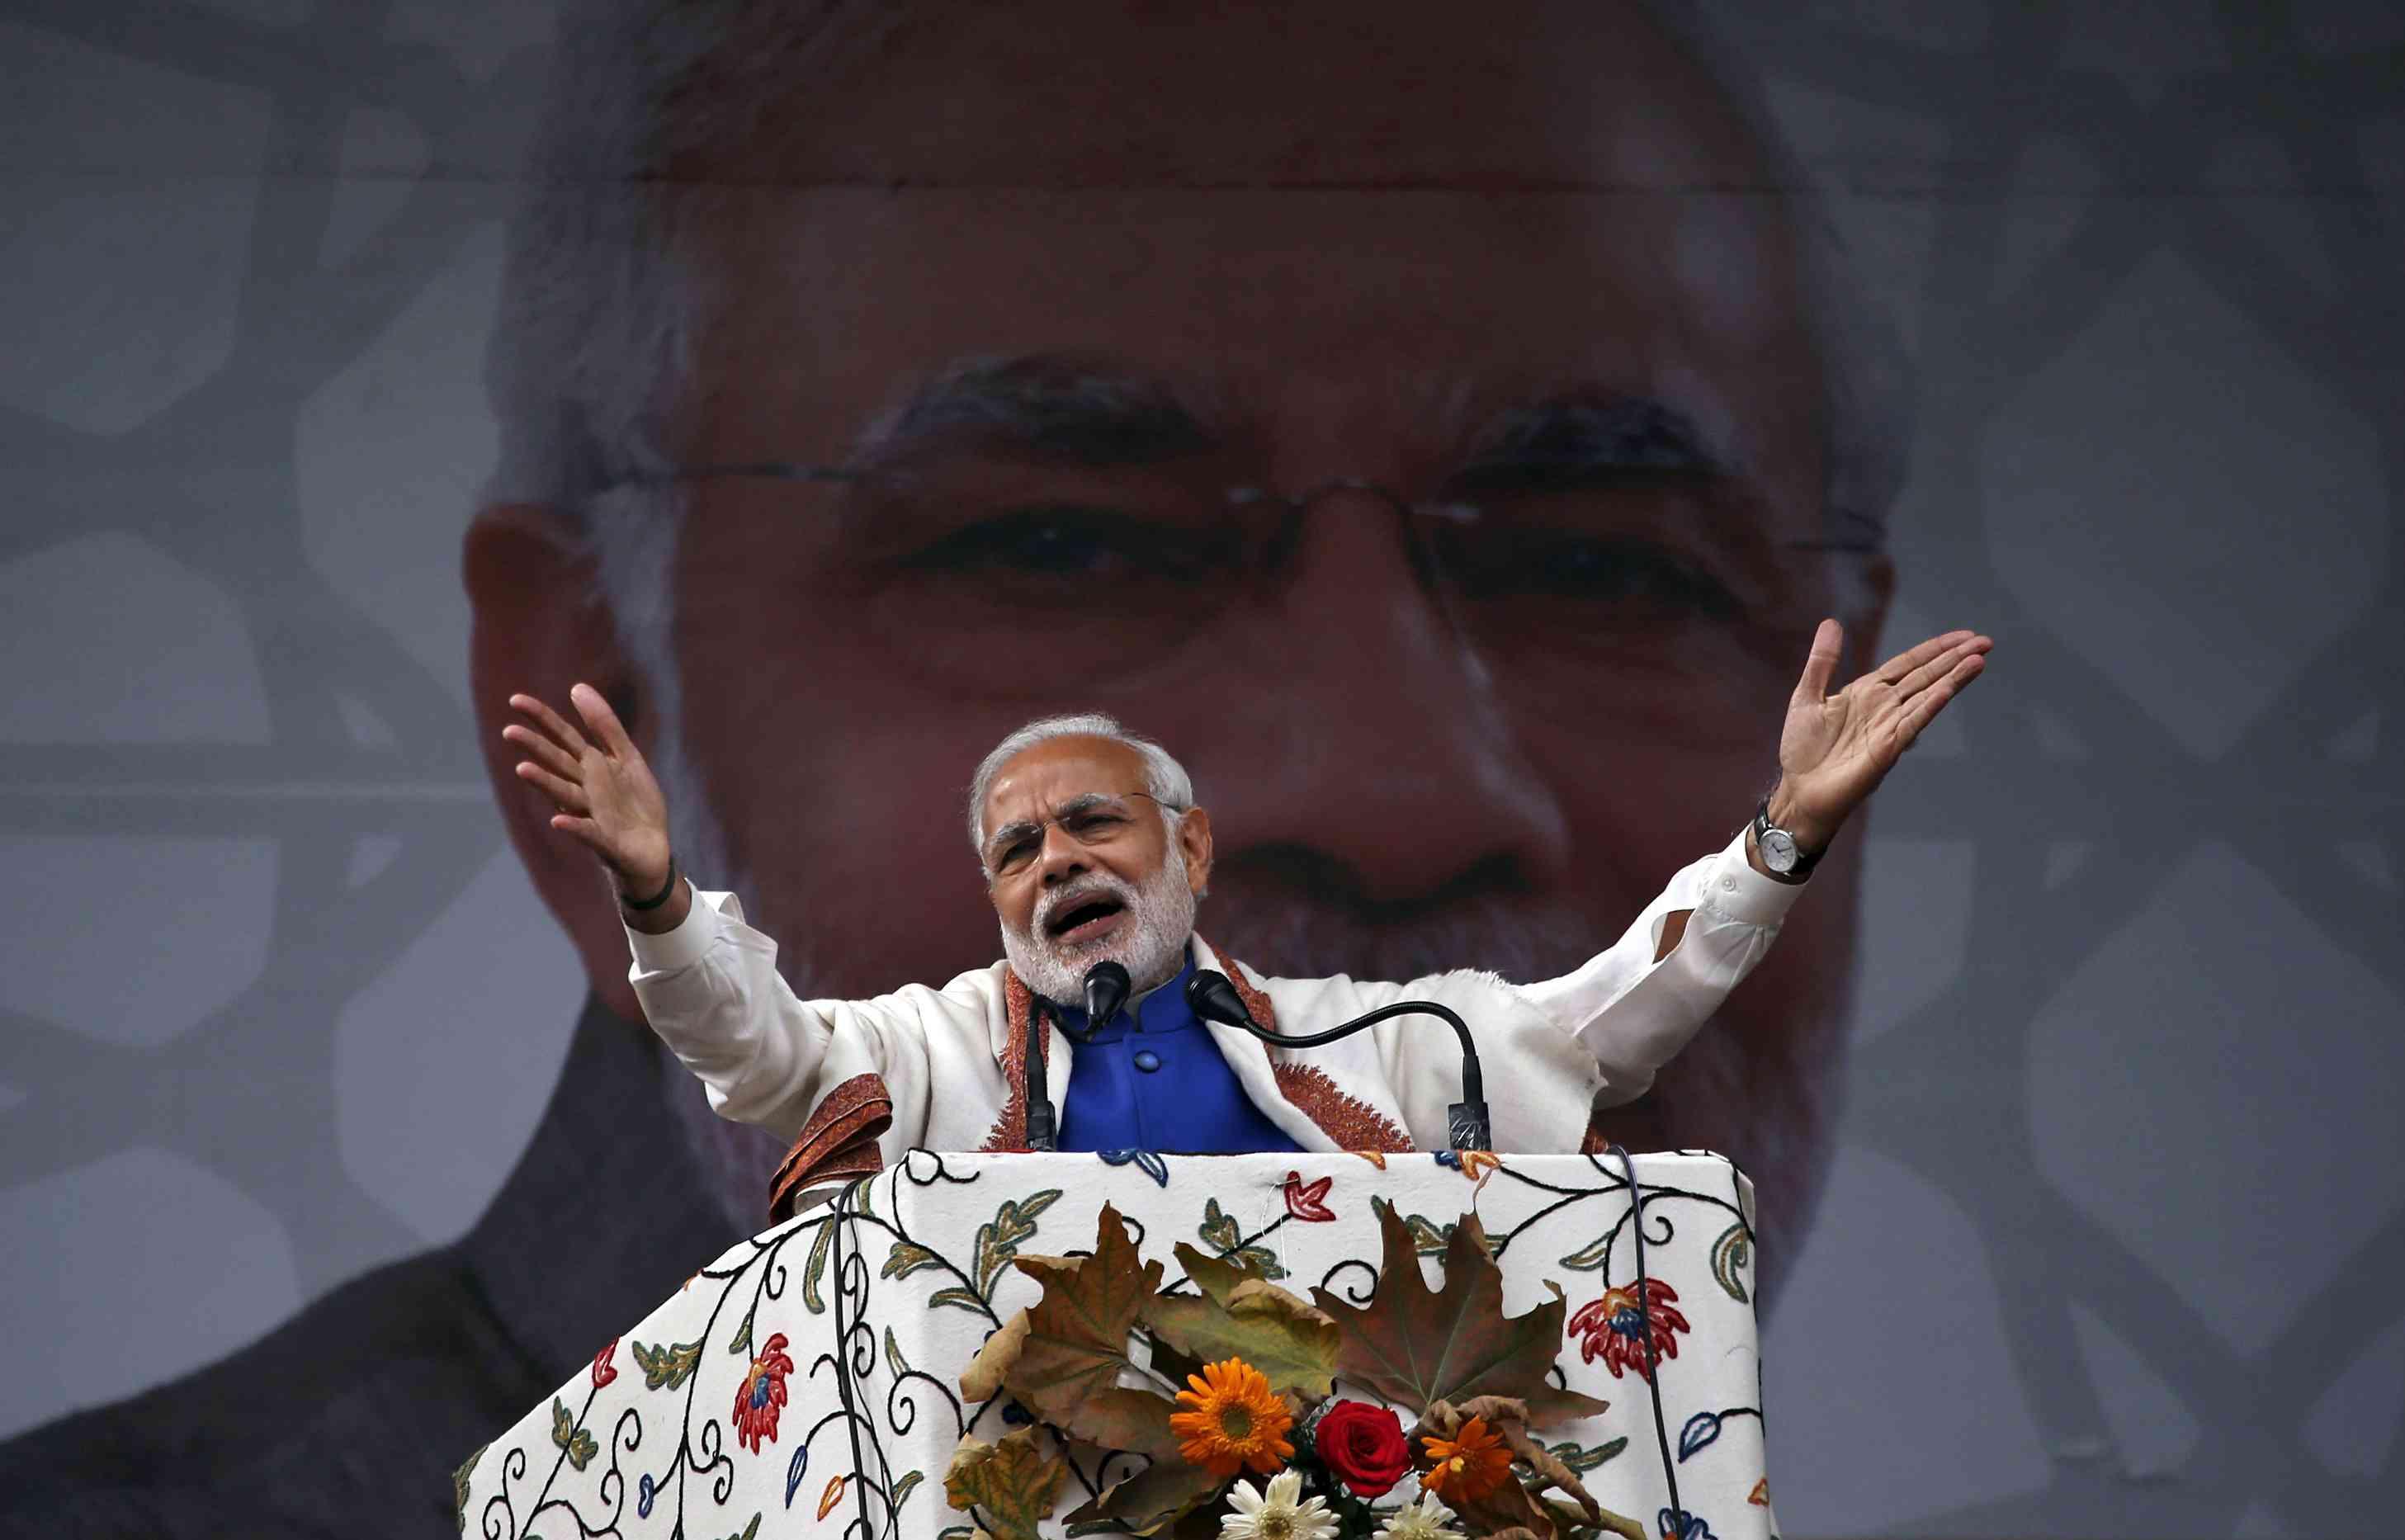 Prime Minister Narendra Modi addresses a rally in a cricket stadium in Srinagar, November 7, 2015. Photo: Reuters